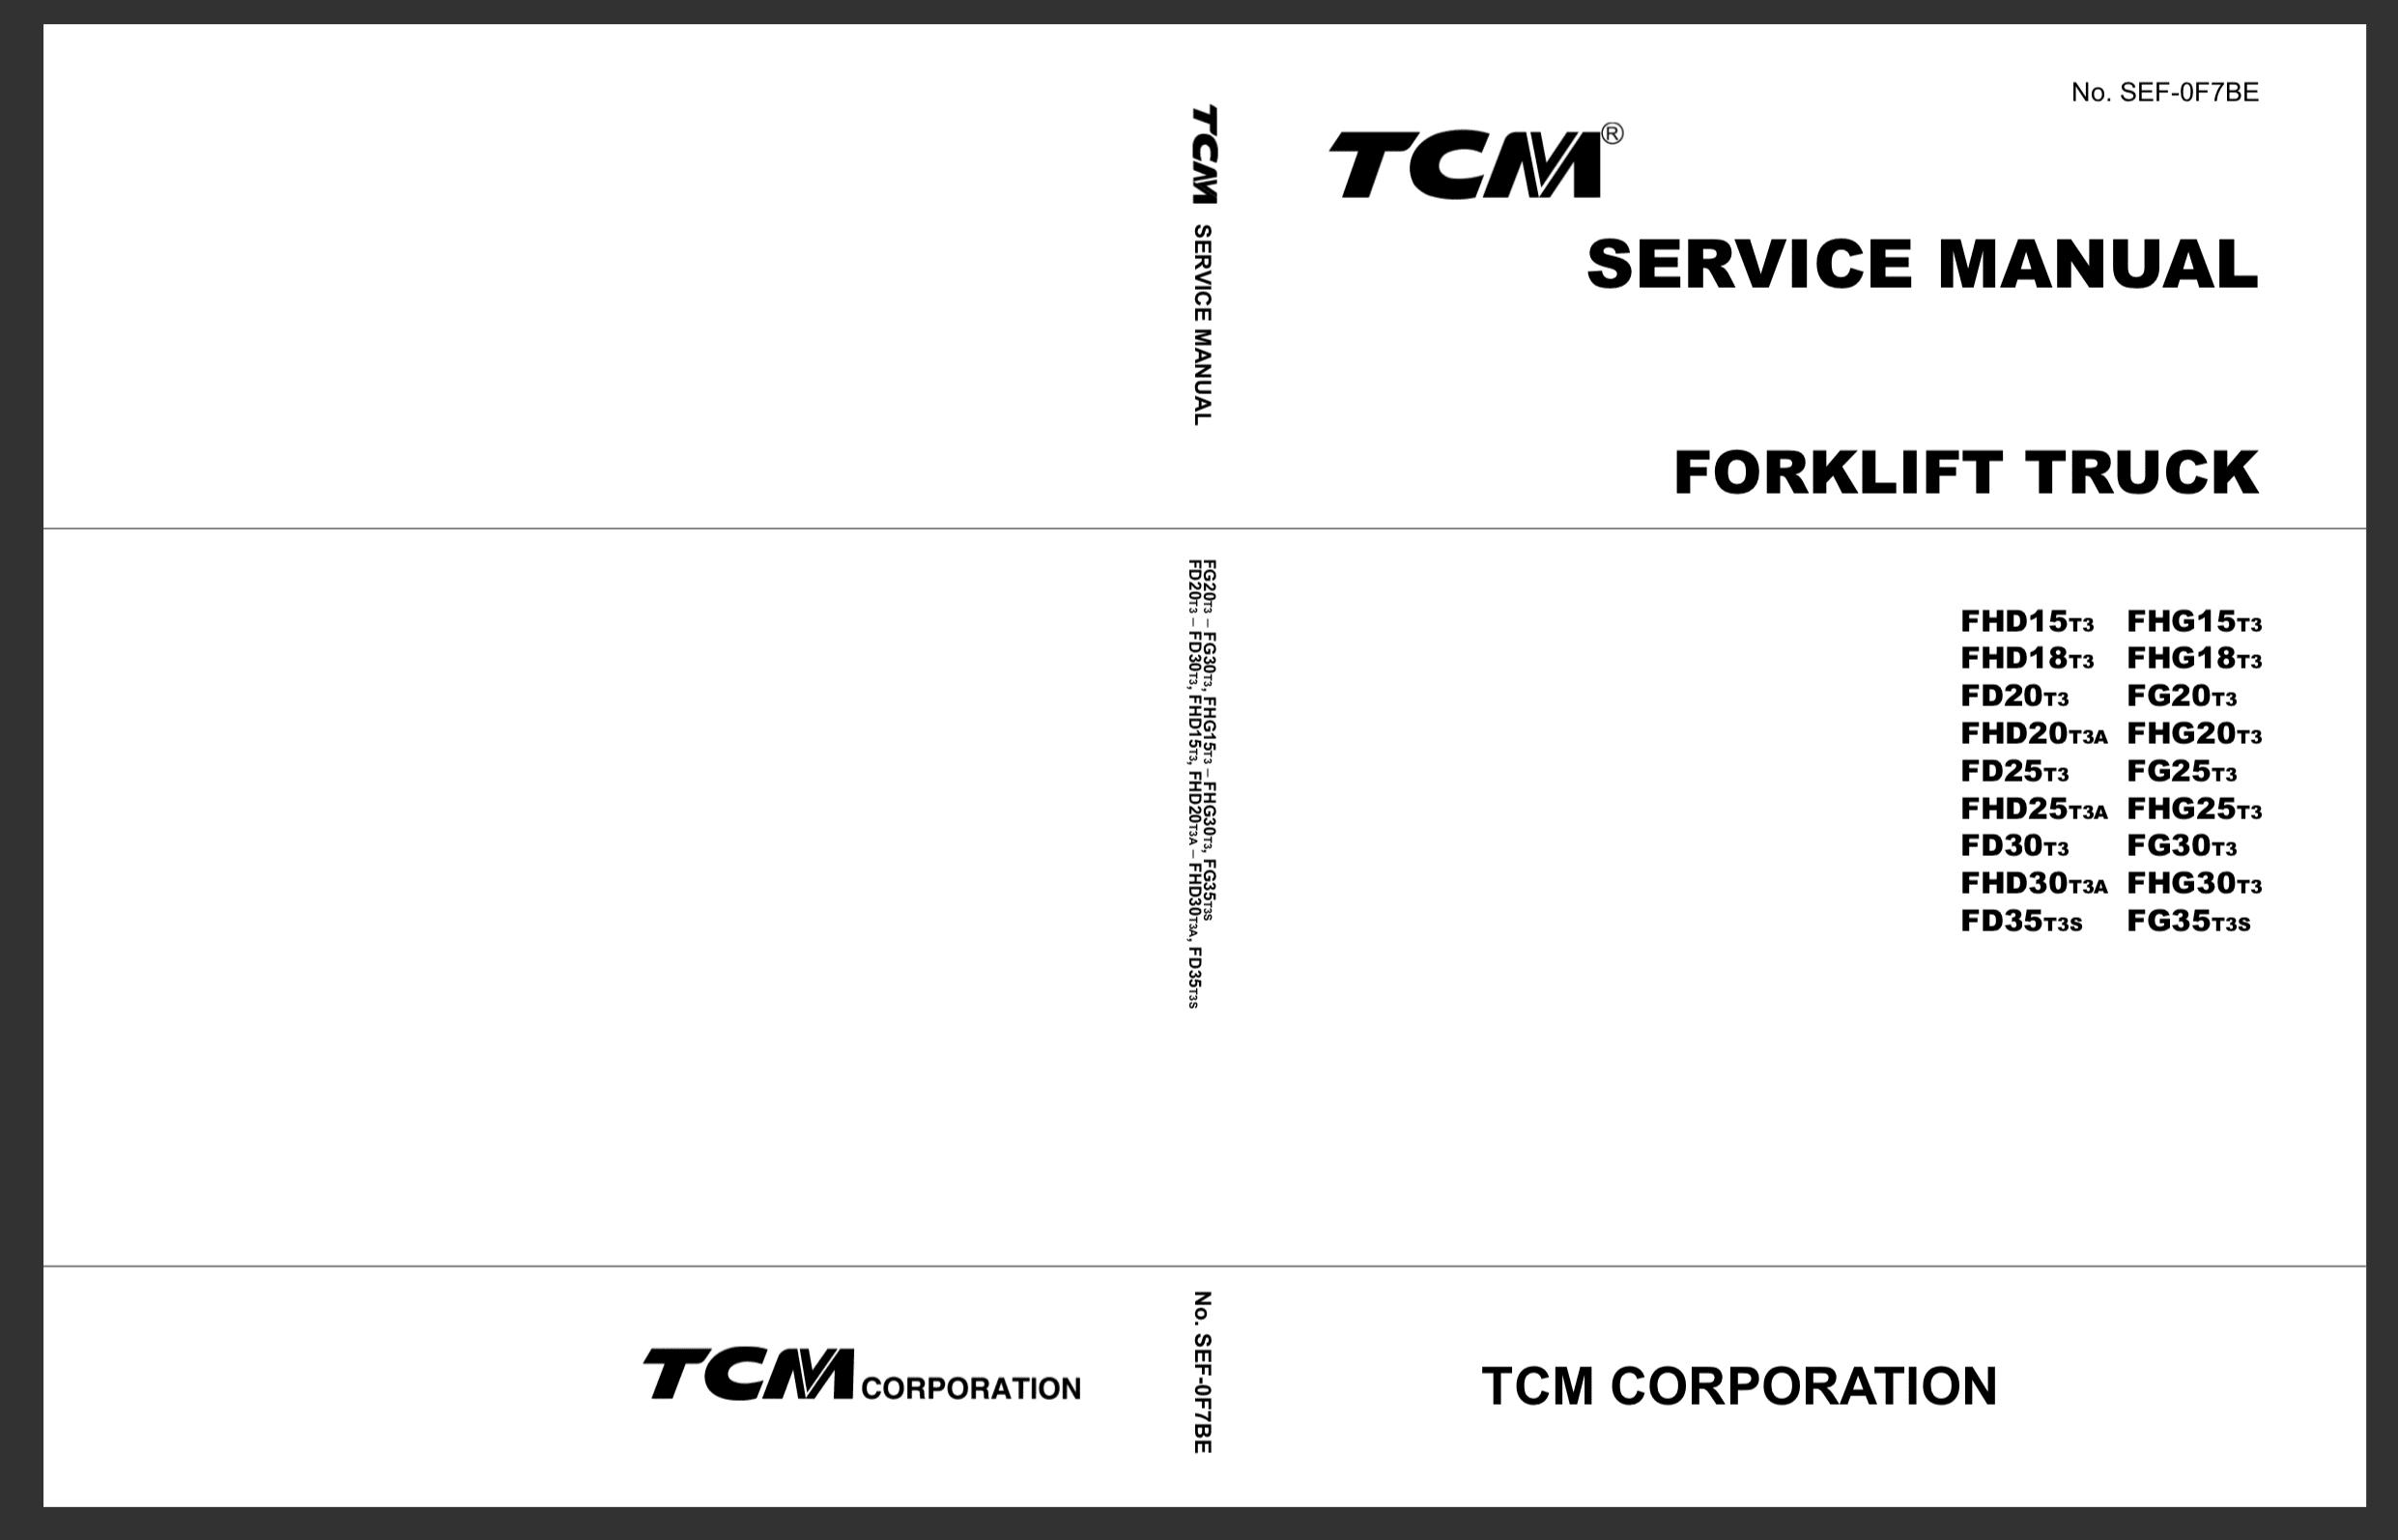 TCM Forklift FD-FHD-FHG 15-35 Service Manual - Auto Repair Software-Auto  EPC Software-Auto Repair Manual-Workshop Manual-Service Manual-Workshop  ManualAuto Repair Software-Auto EPC Software-Auto Repair Manual